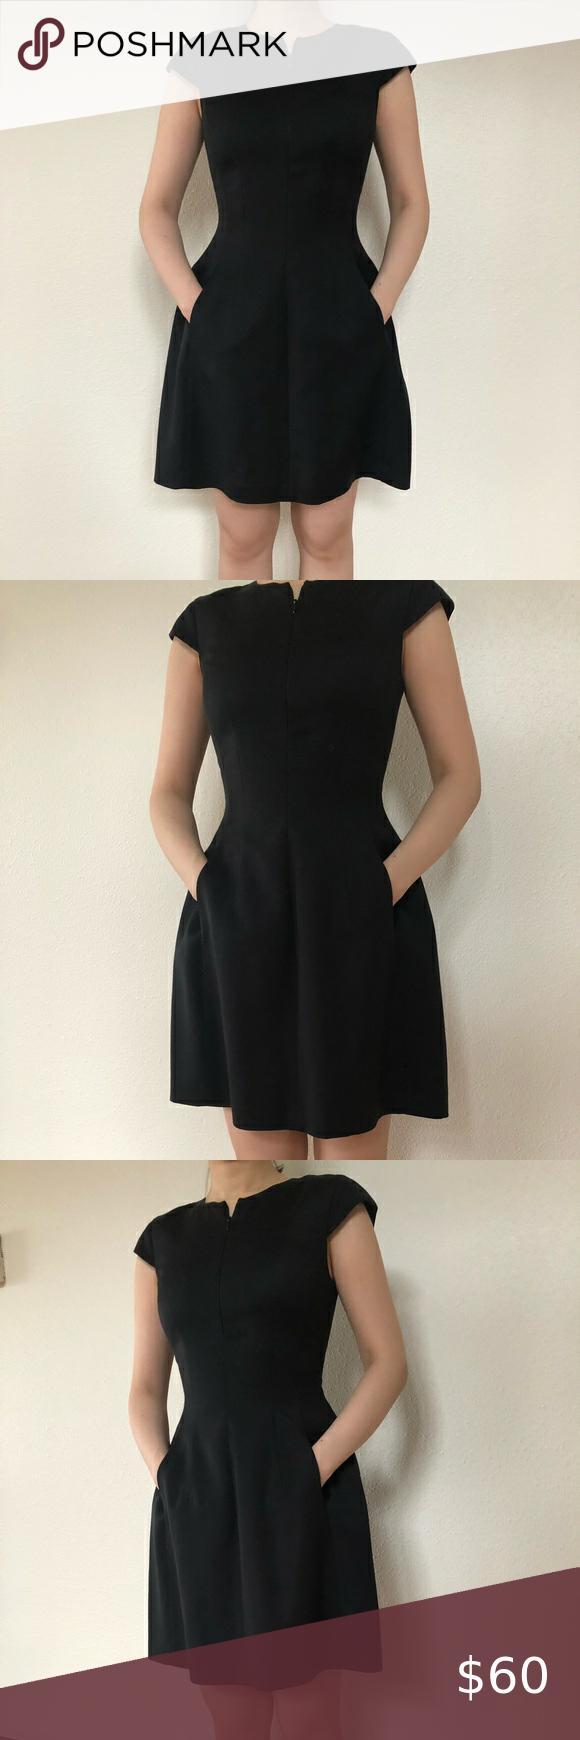 Armani Exchange Black Dress With Pockets Size 0 Black Dress With Pockets Black Dress Dresses [ 1740 x 580 Pixel ]